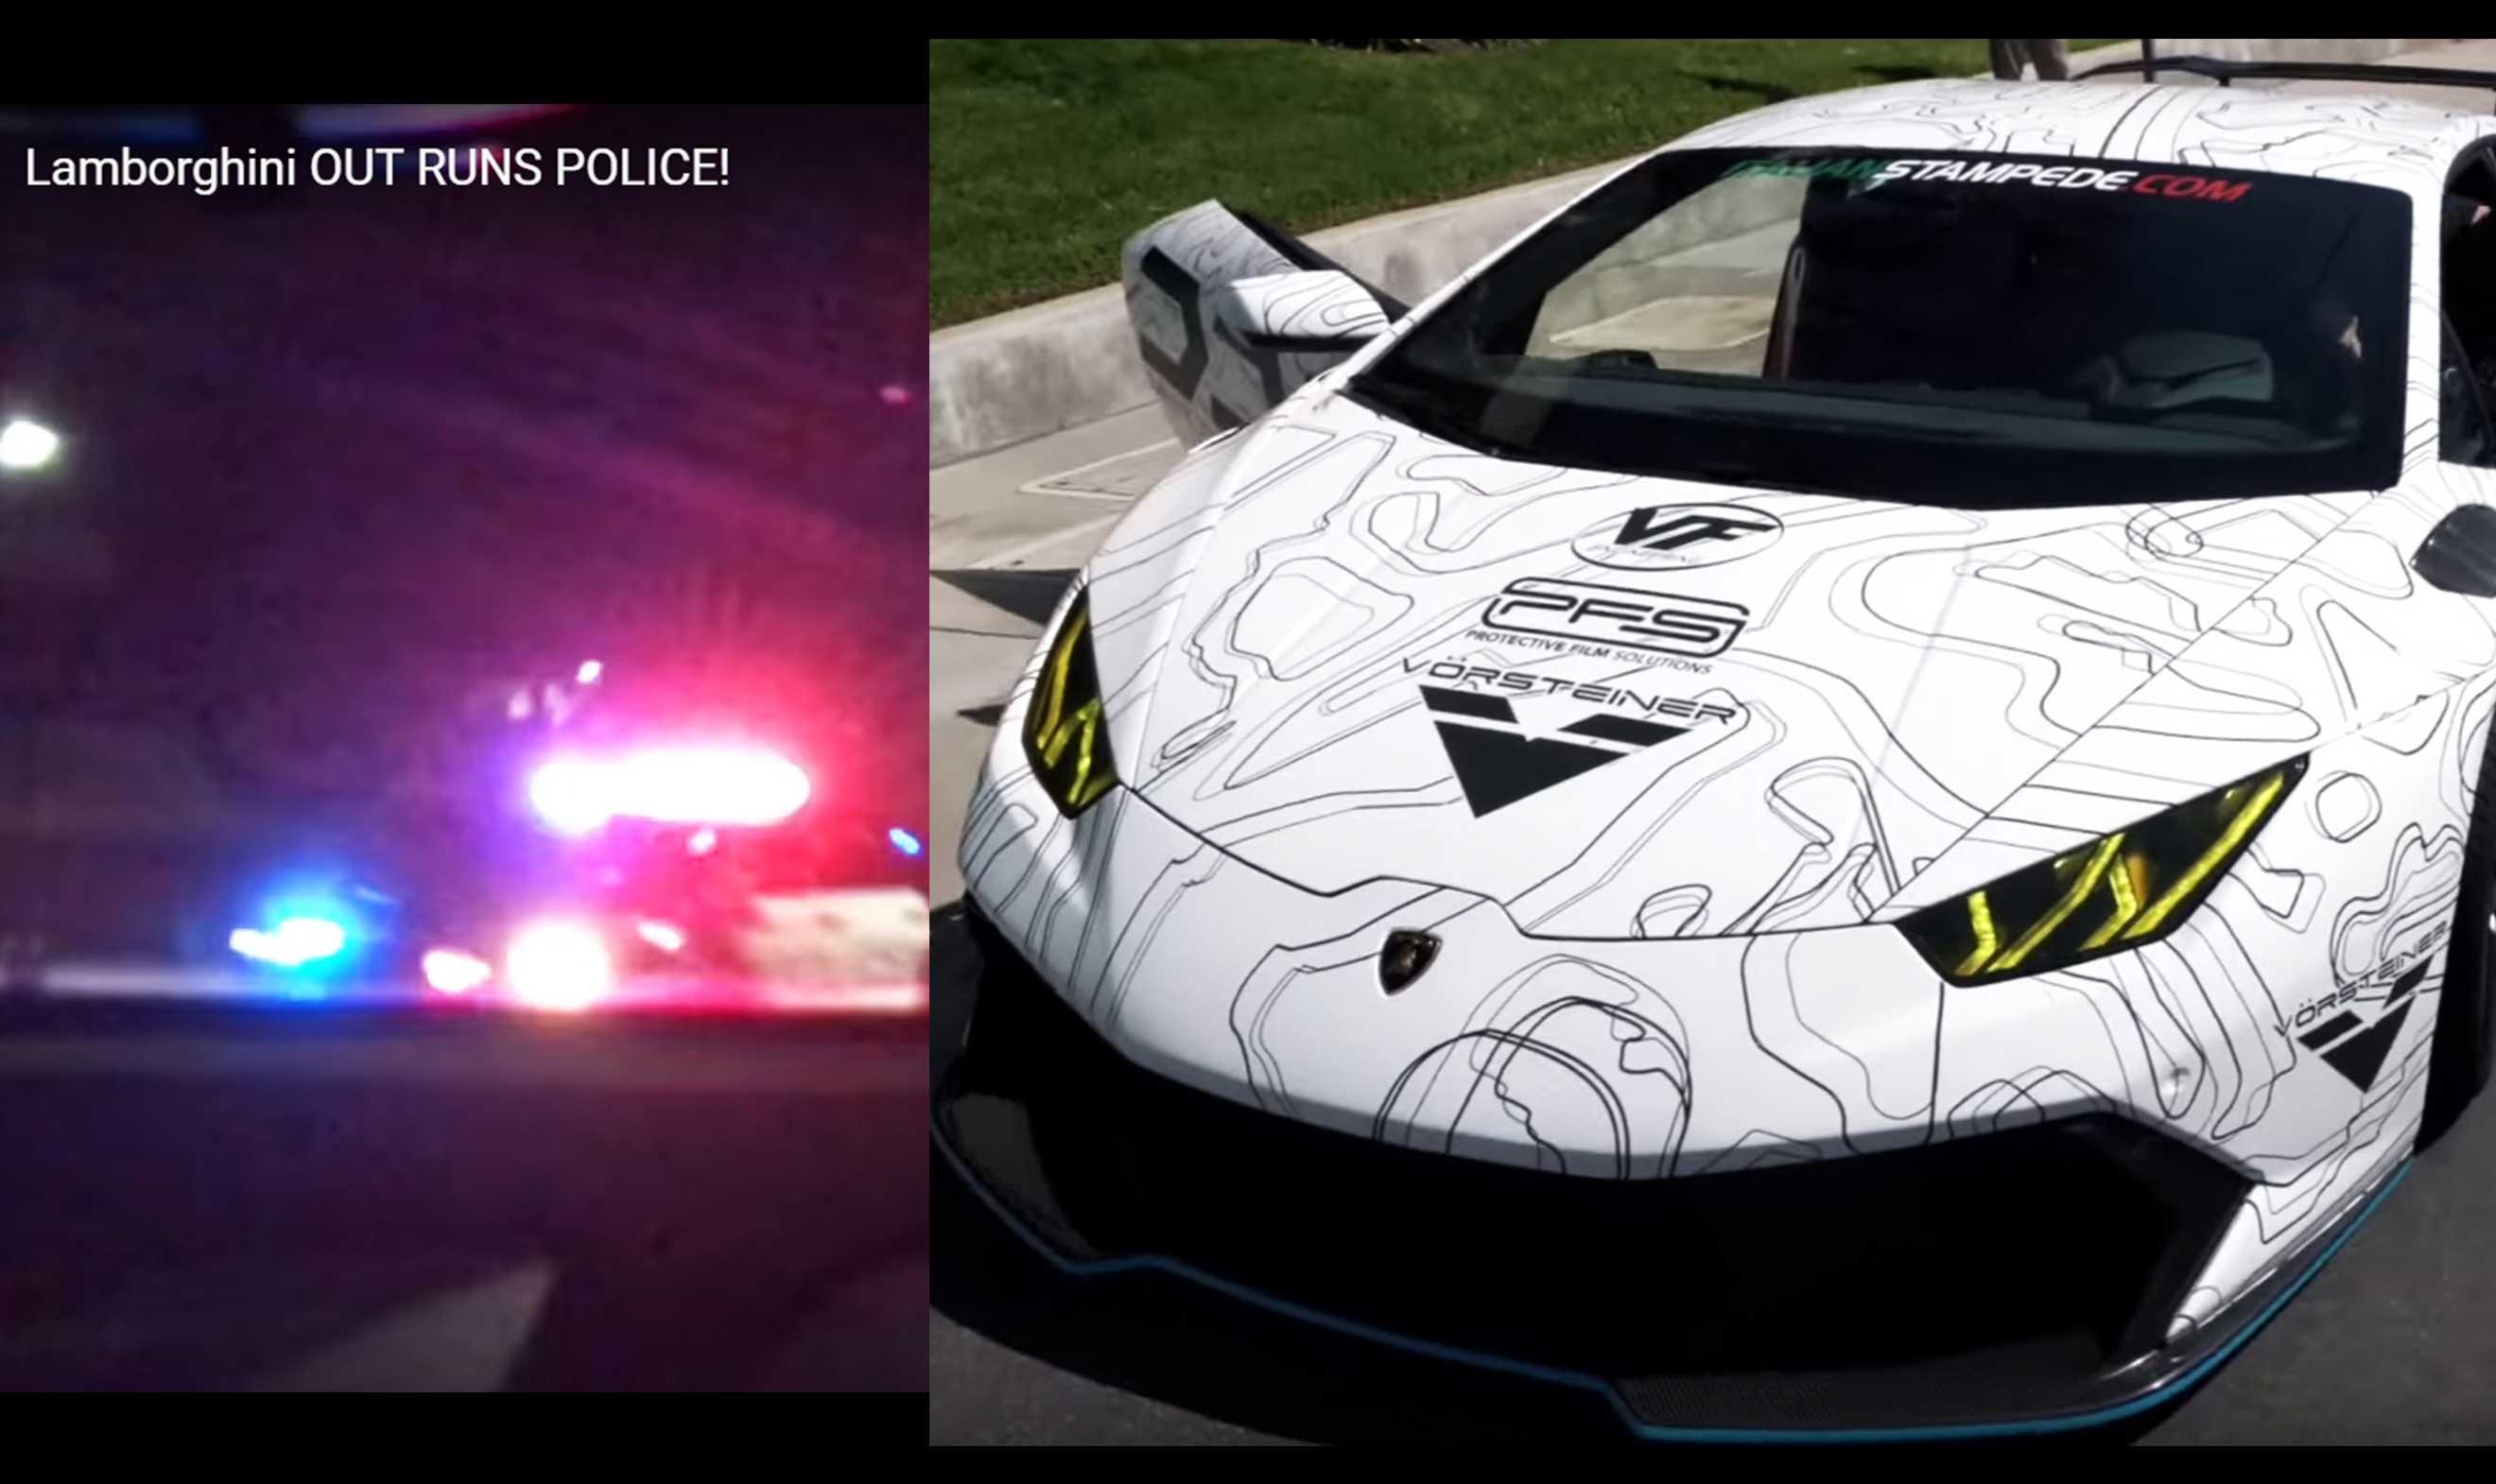 Lamborghini 'chase' posted on YouTube prompts backlash